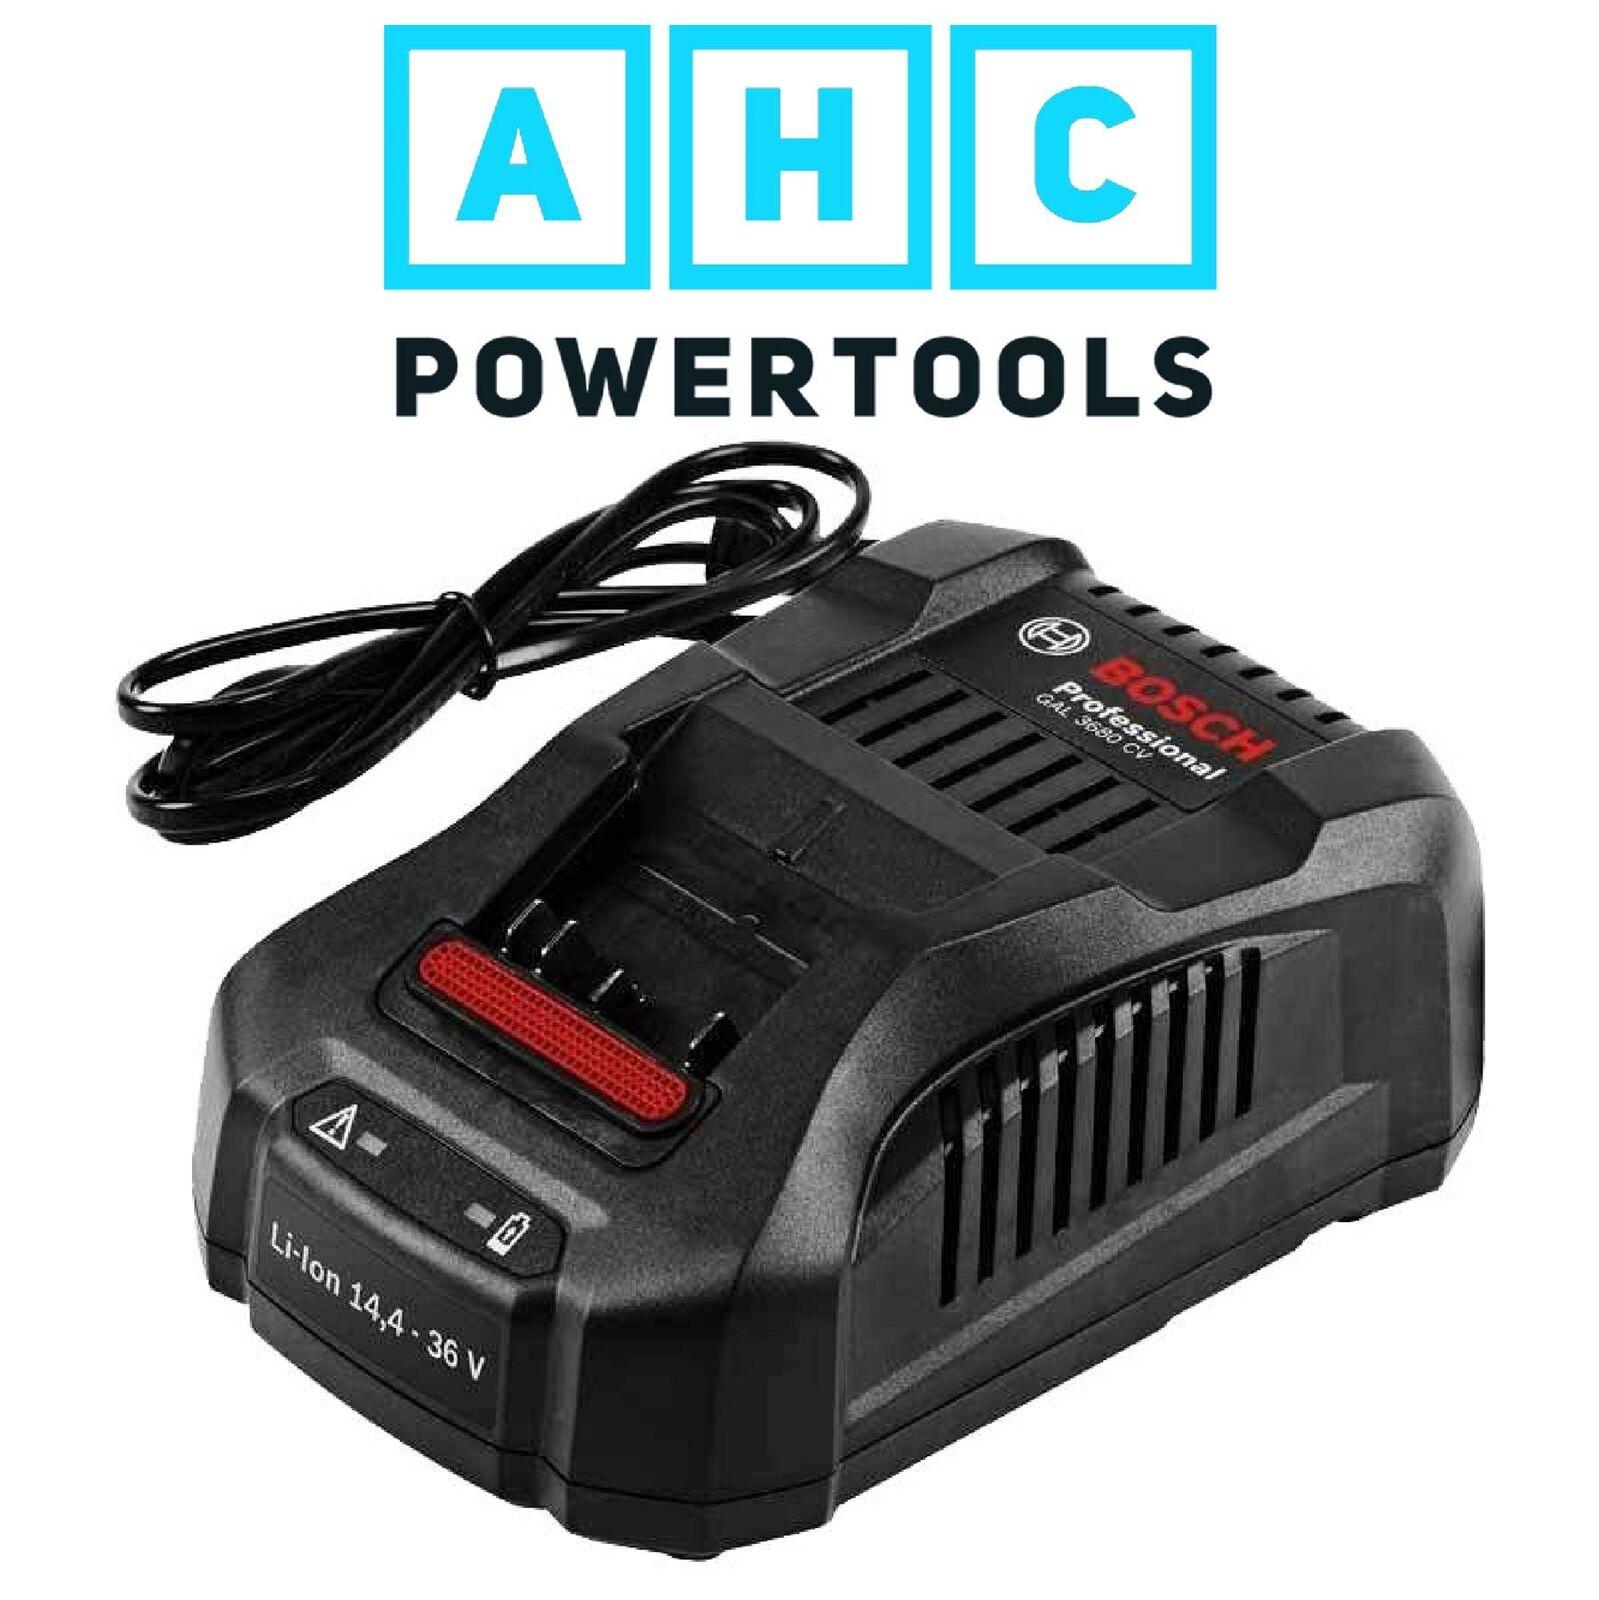 Bosch GAL 3680 CV Battery Charger Multi-Volt Professional (14.4 - 36V)